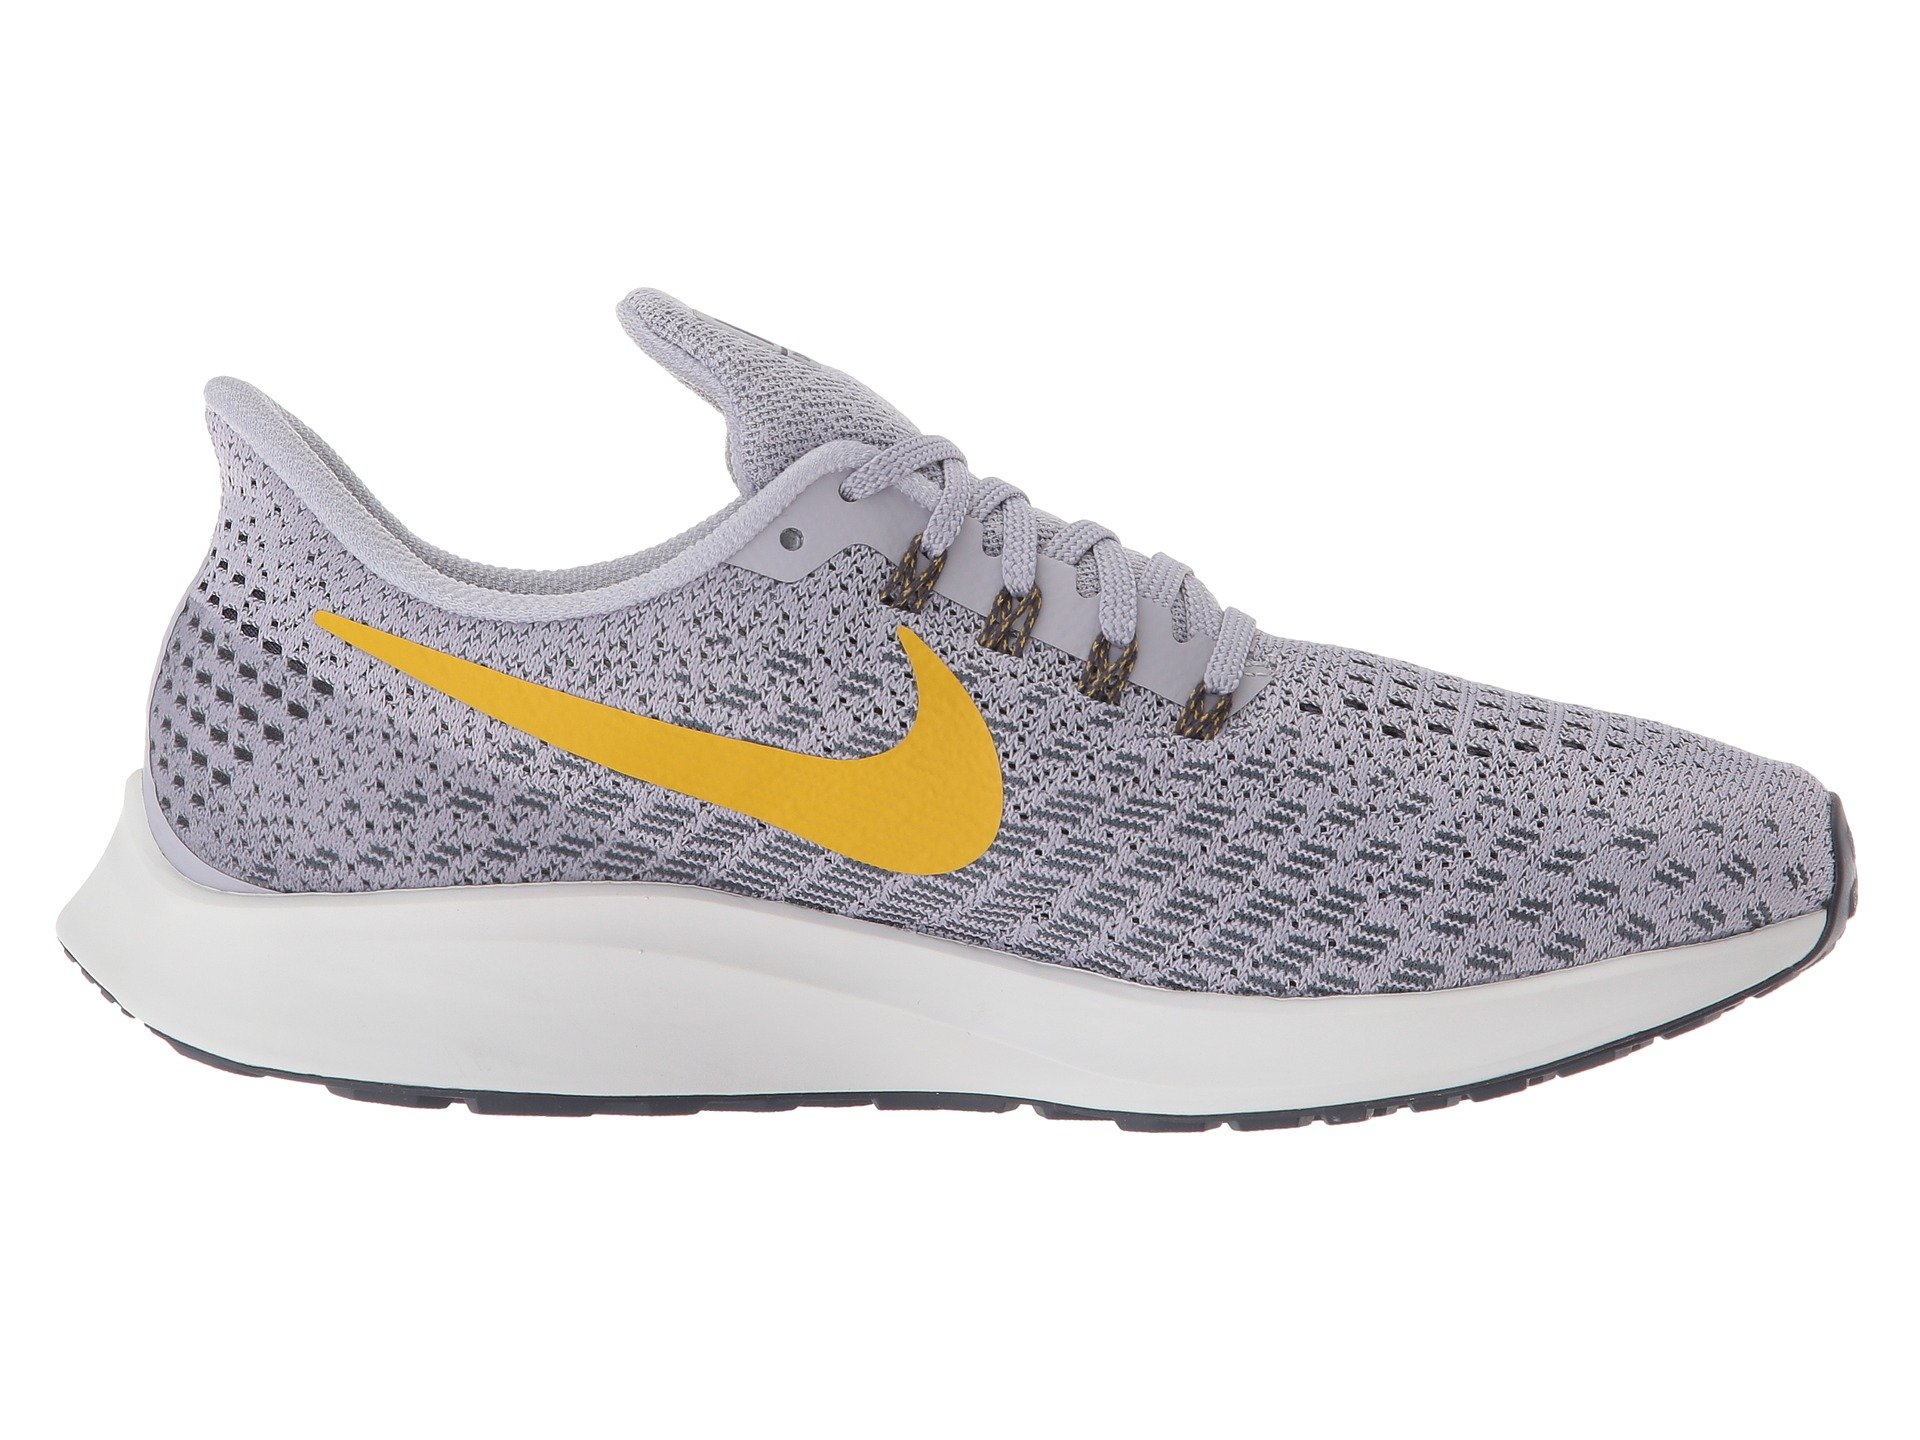 Nike WMNS Air Zoom Pegasus 35 Womens 942855-500 Size 5 by Nike (Image #8)